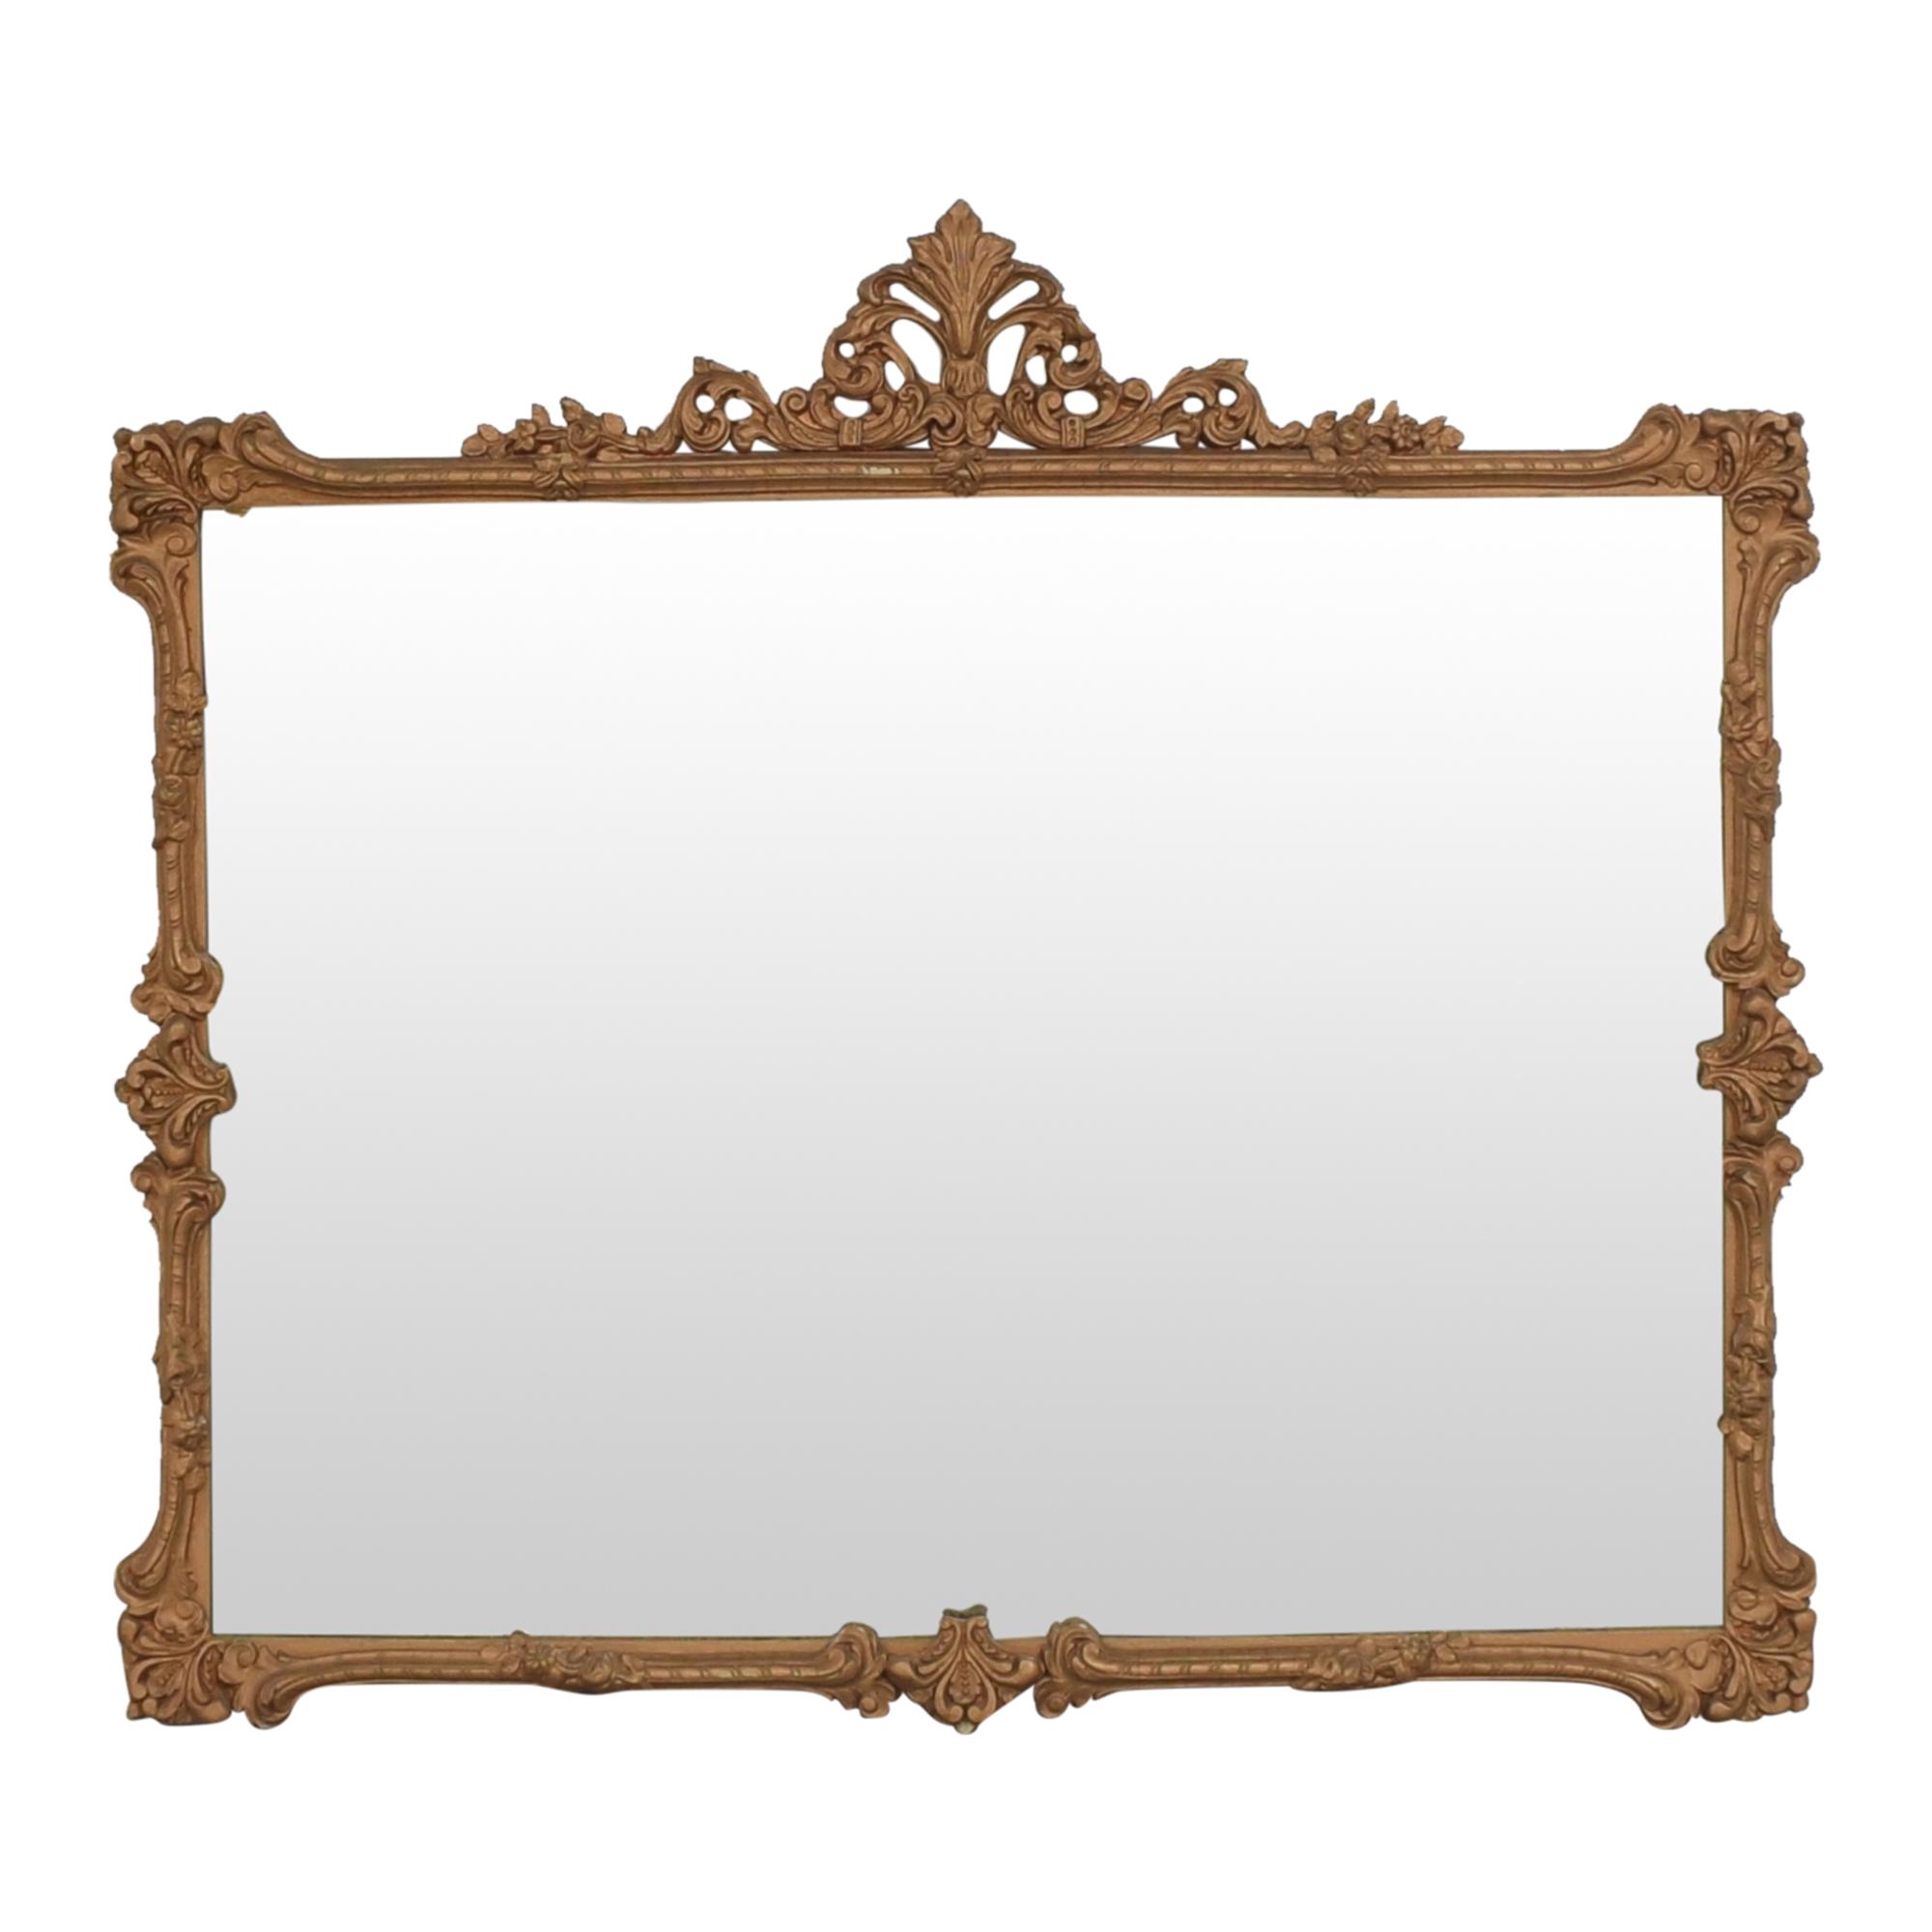 Antique Ornate Frame Mirror